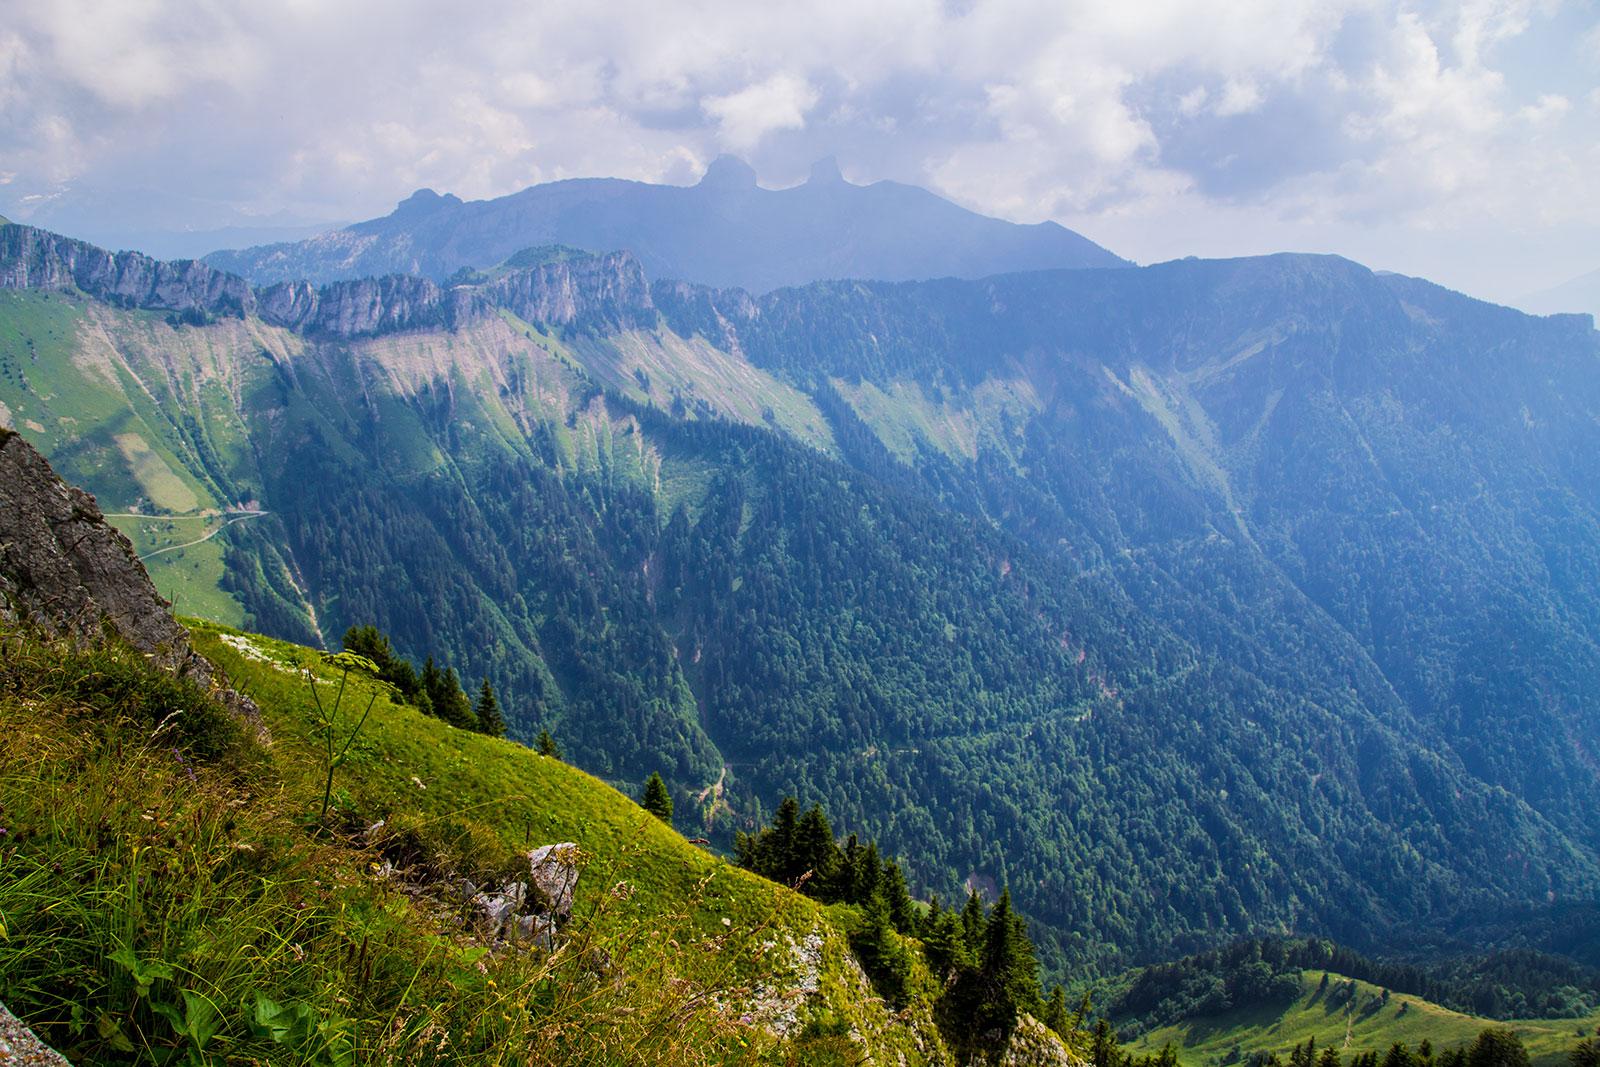 Rochers de Naye - Montreux la joya del lago Lemán